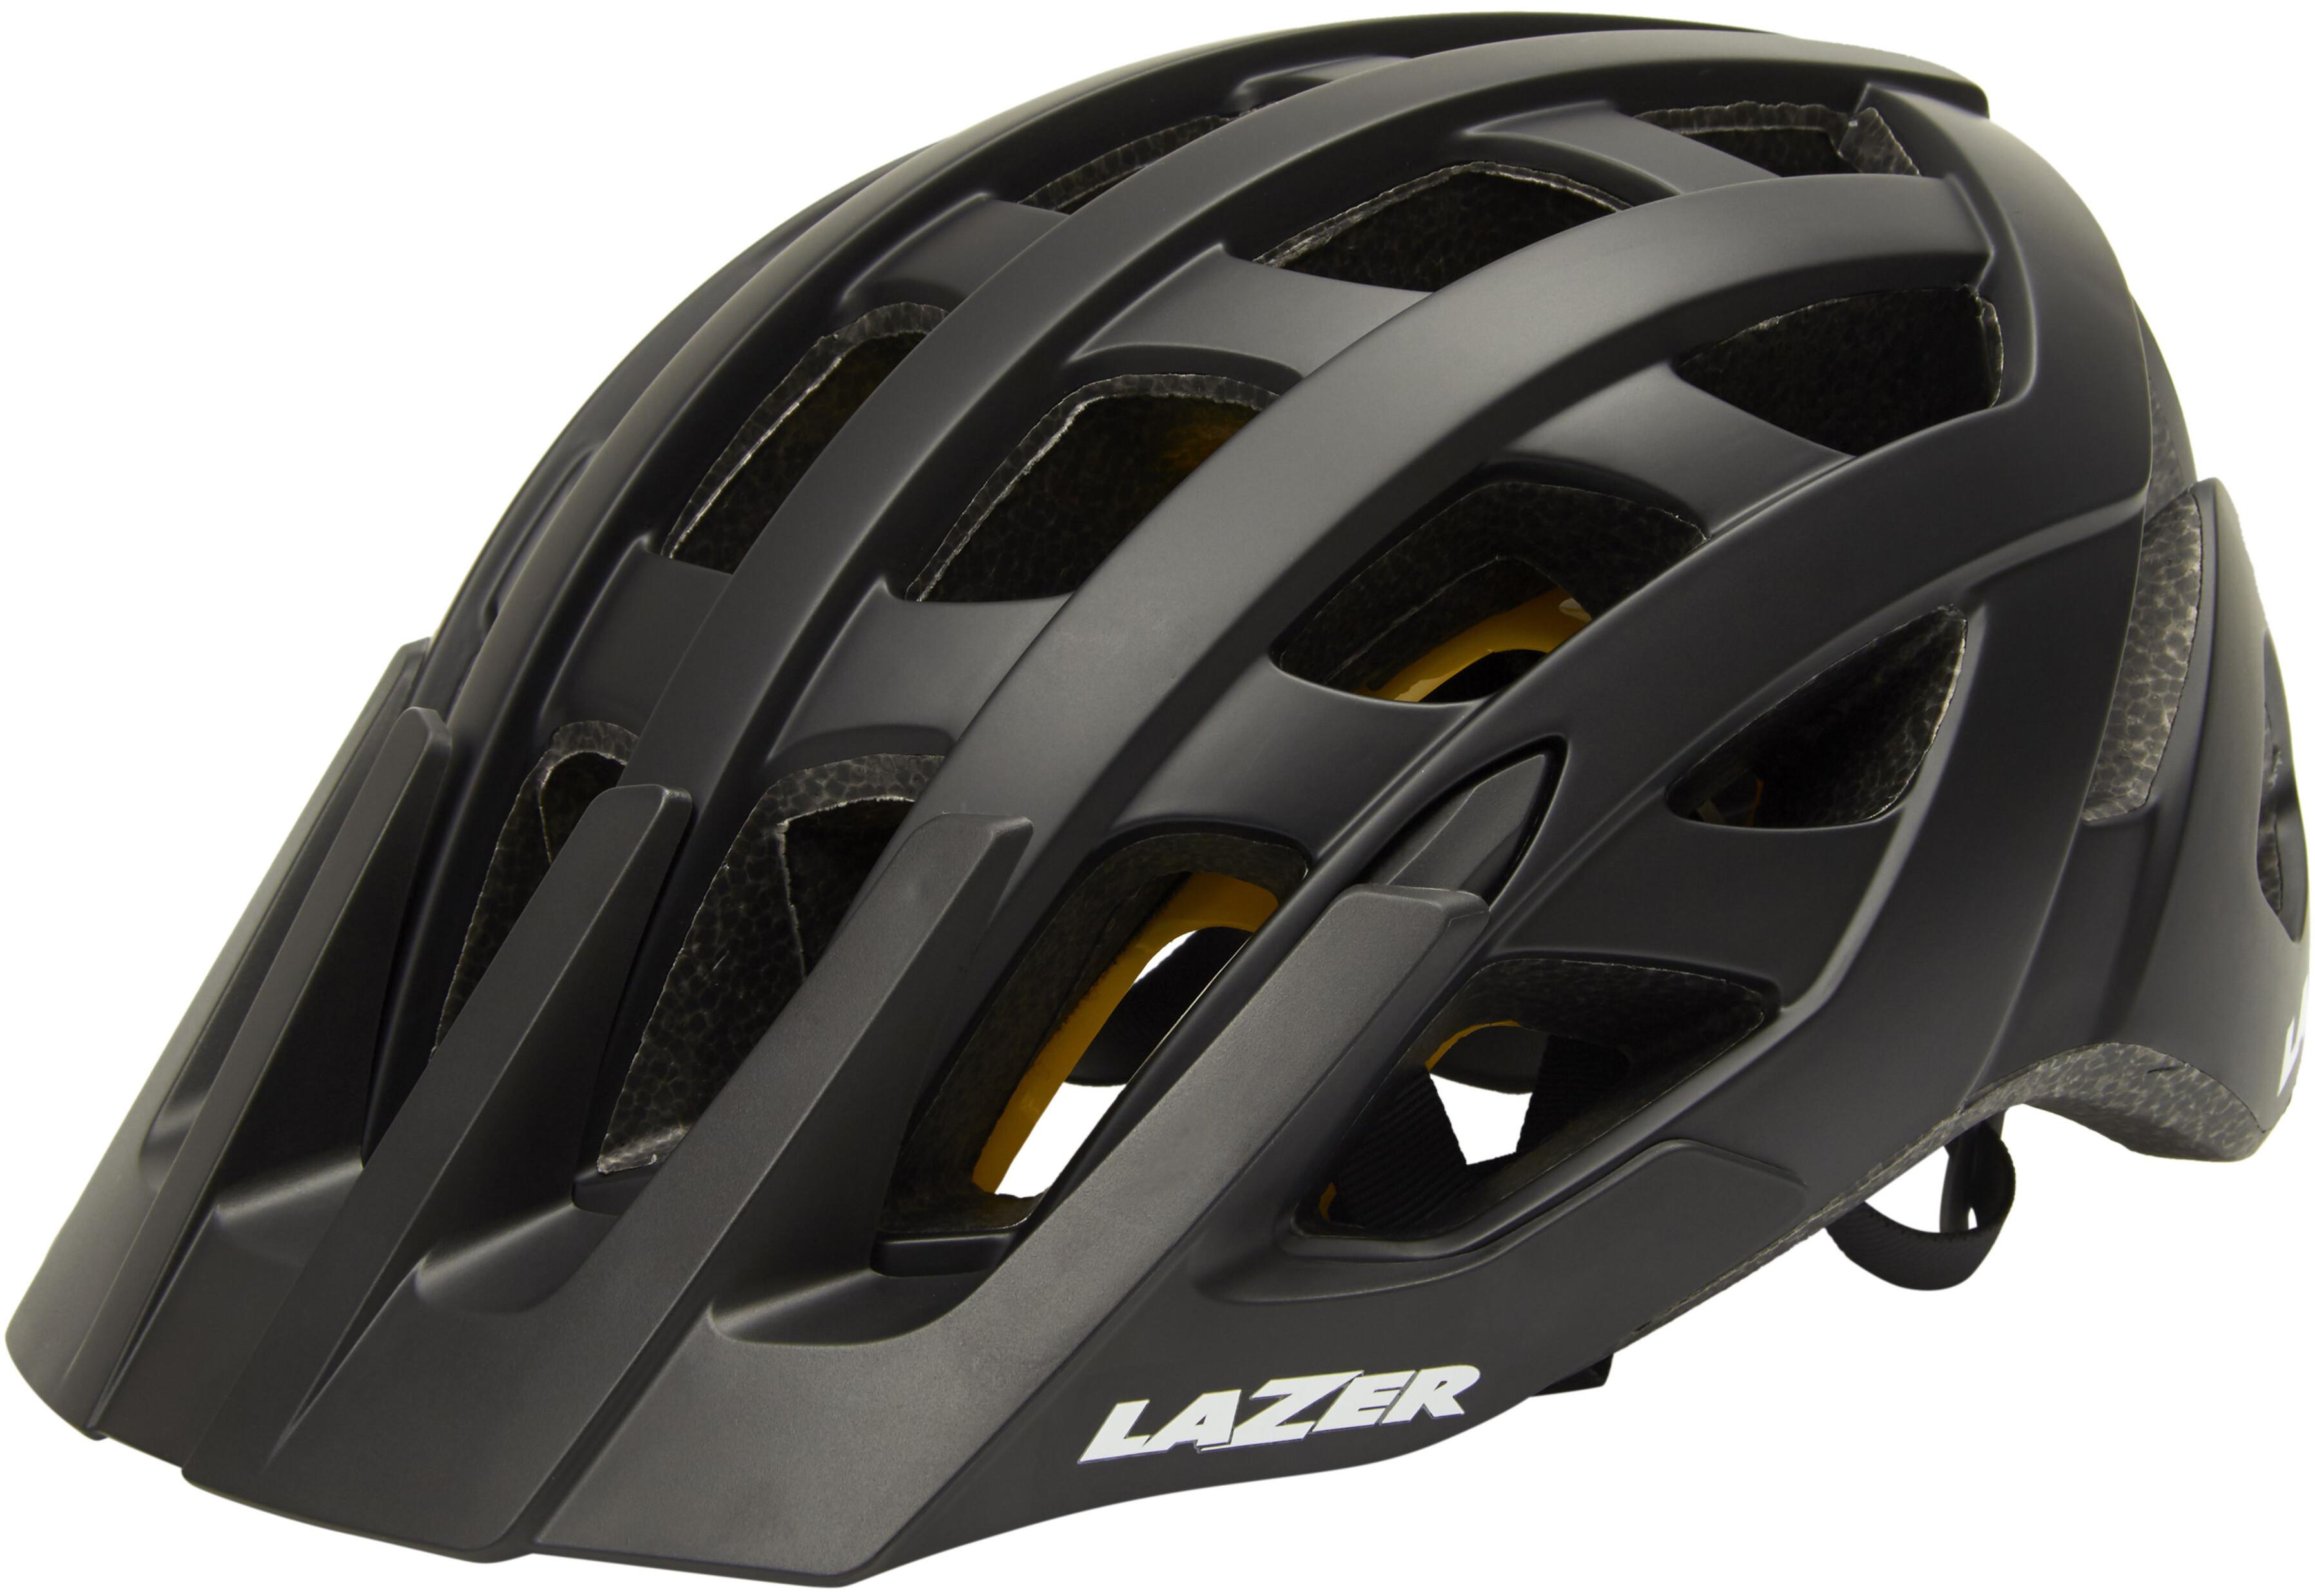 lazer roller mips helmet mat black g nstig kaufen br gelmann. Black Bedroom Furniture Sets. Home Design Ideas